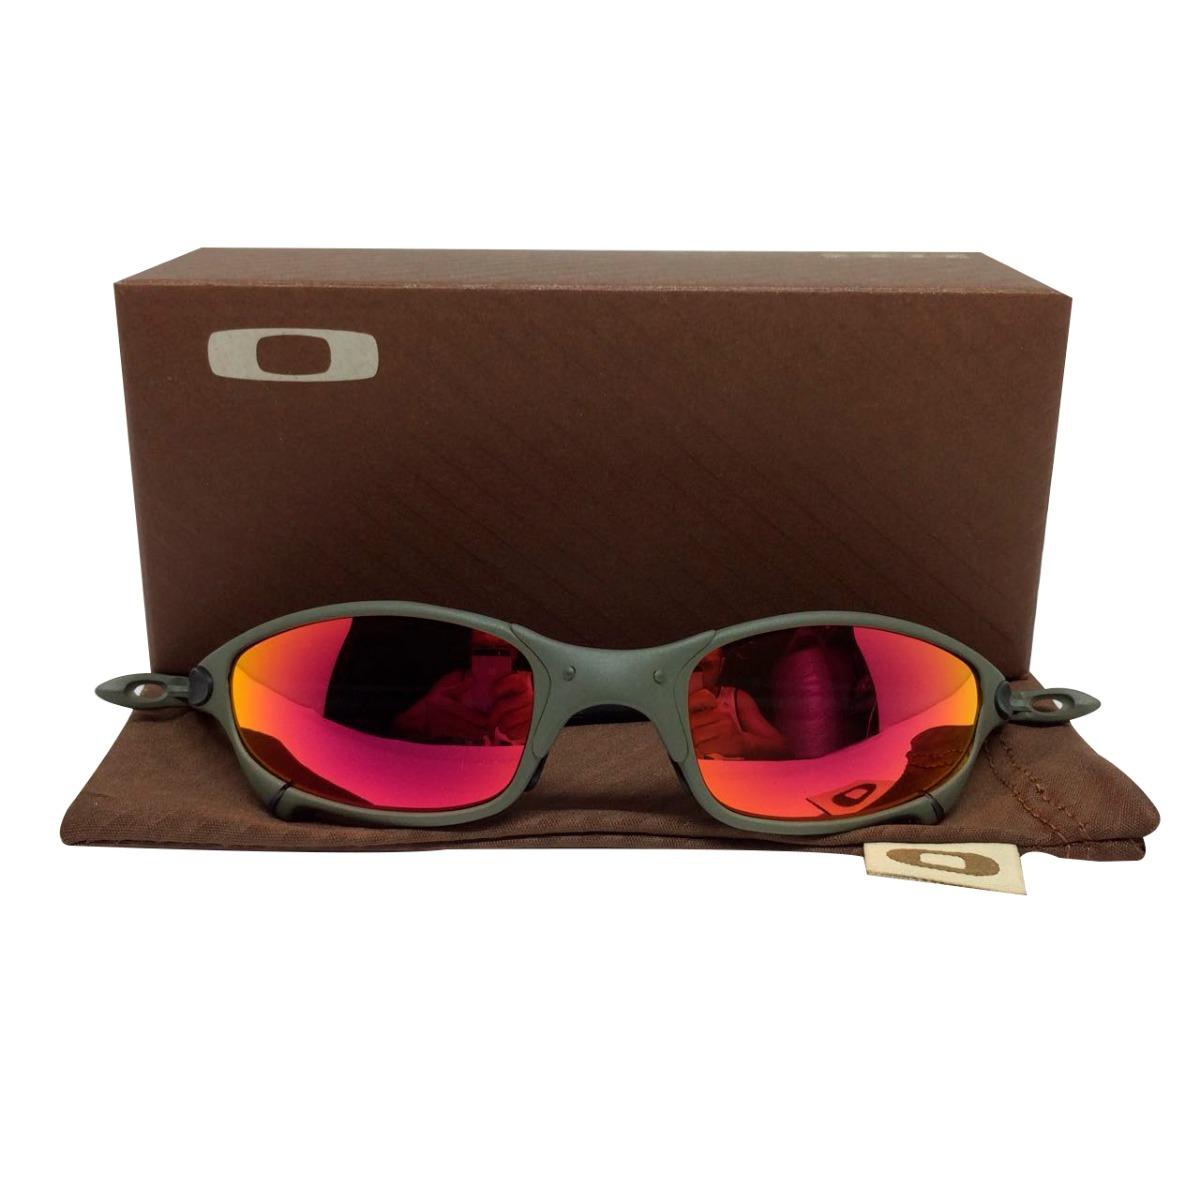 ef6bb9f6d óculos oakley juliet x metal dark ruby frete grátis 2019. Carregando zoom.